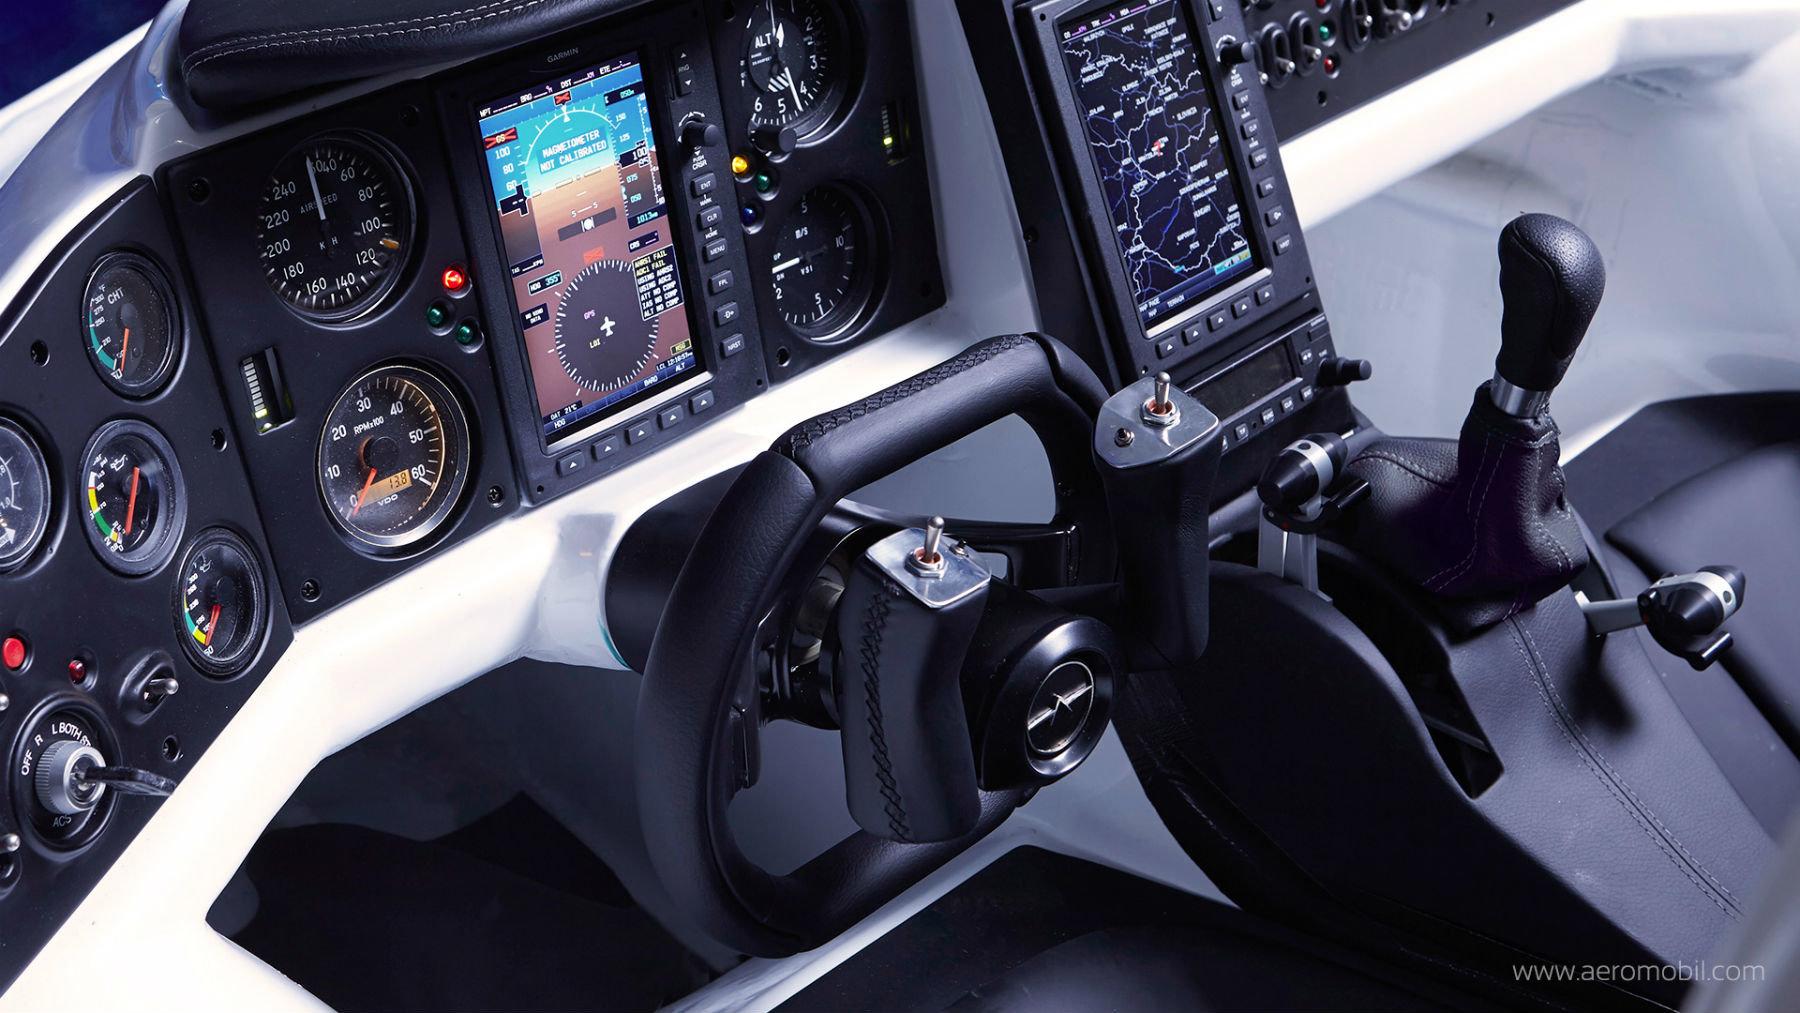 AeroMobil-3.0-11-10-2016